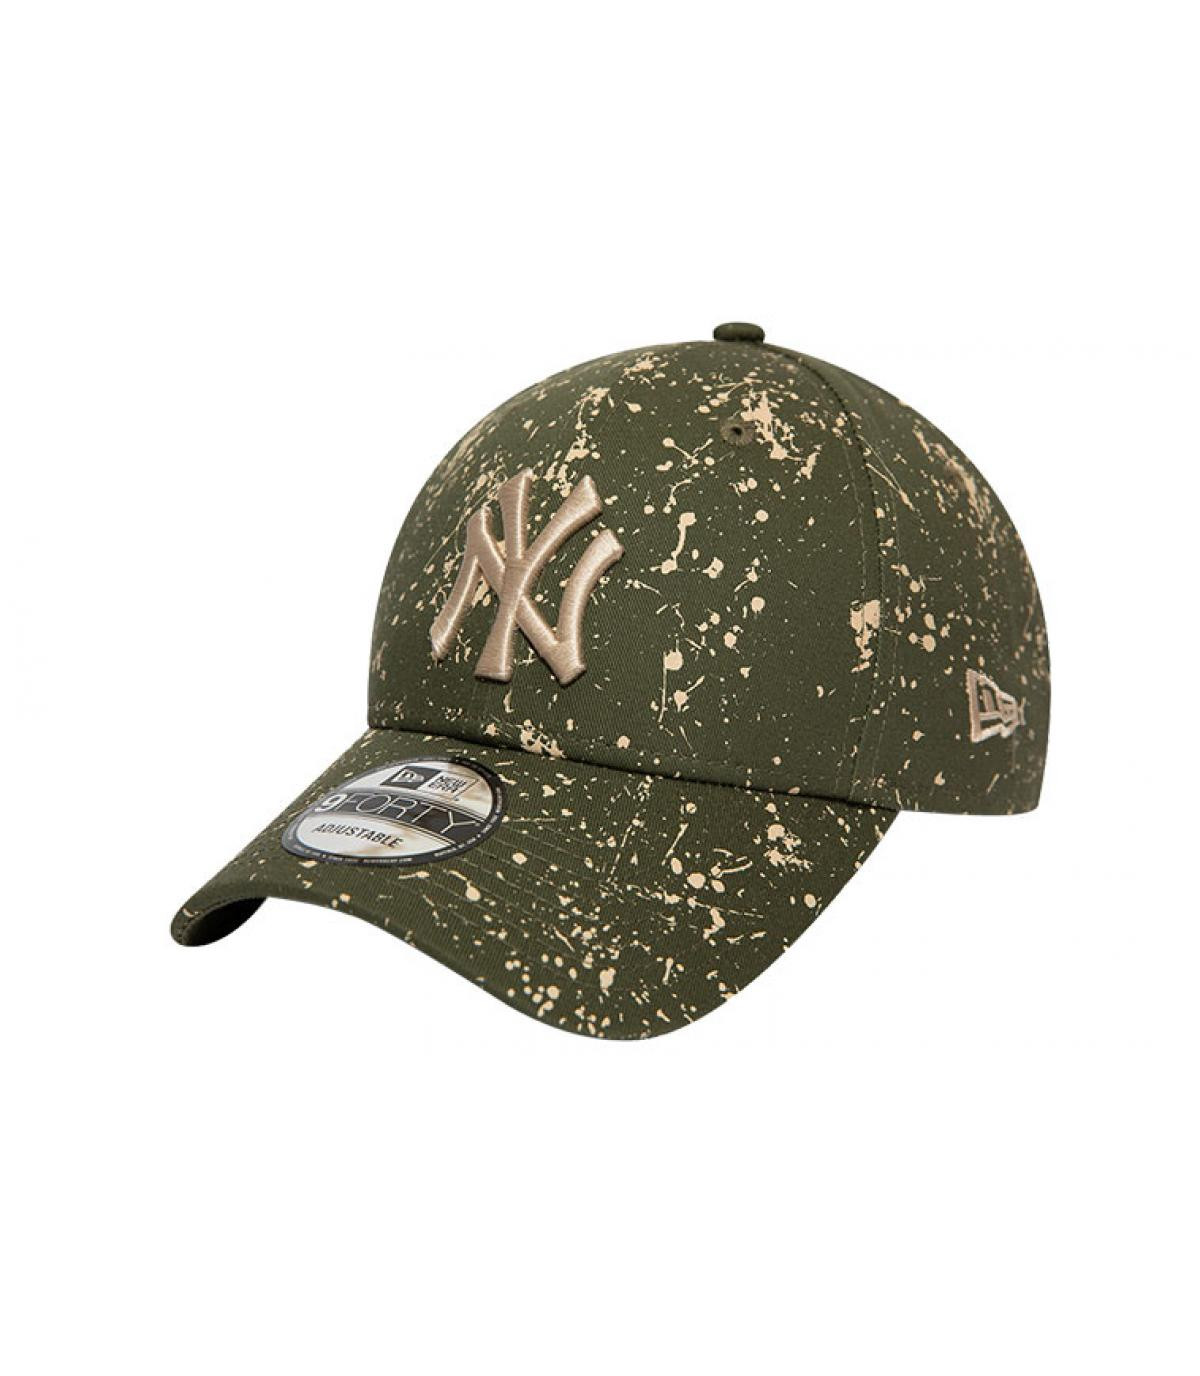 Details Cap MLB Paints NY 940 olive - Abbildung 2